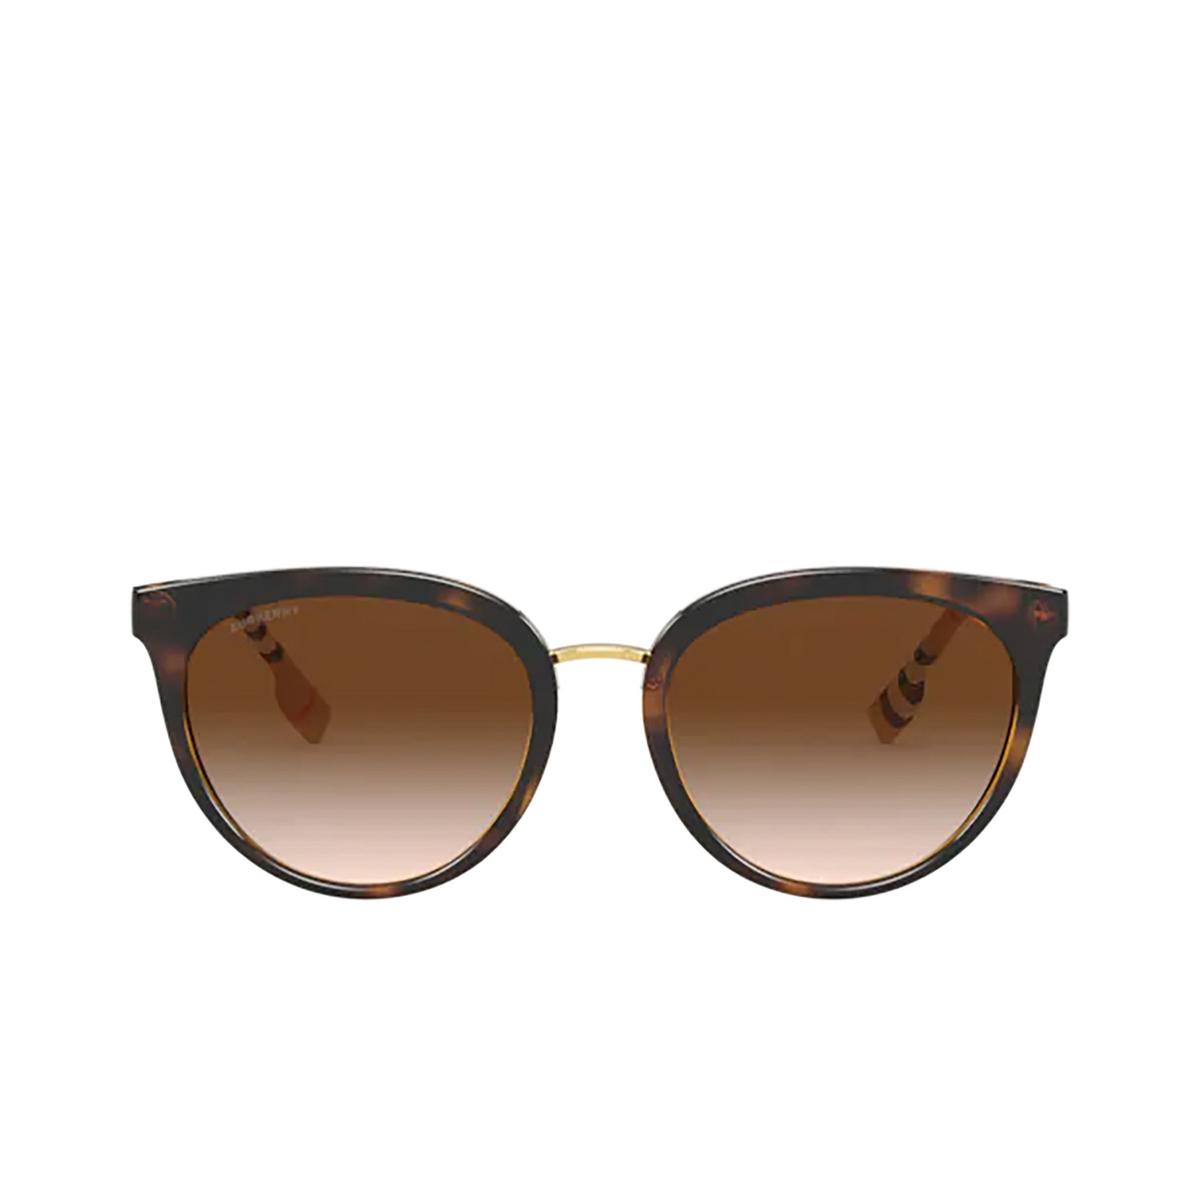 Burberry® Round Sunglasses: Willow BE4316 color Dark Havana 389013 - 1/3.